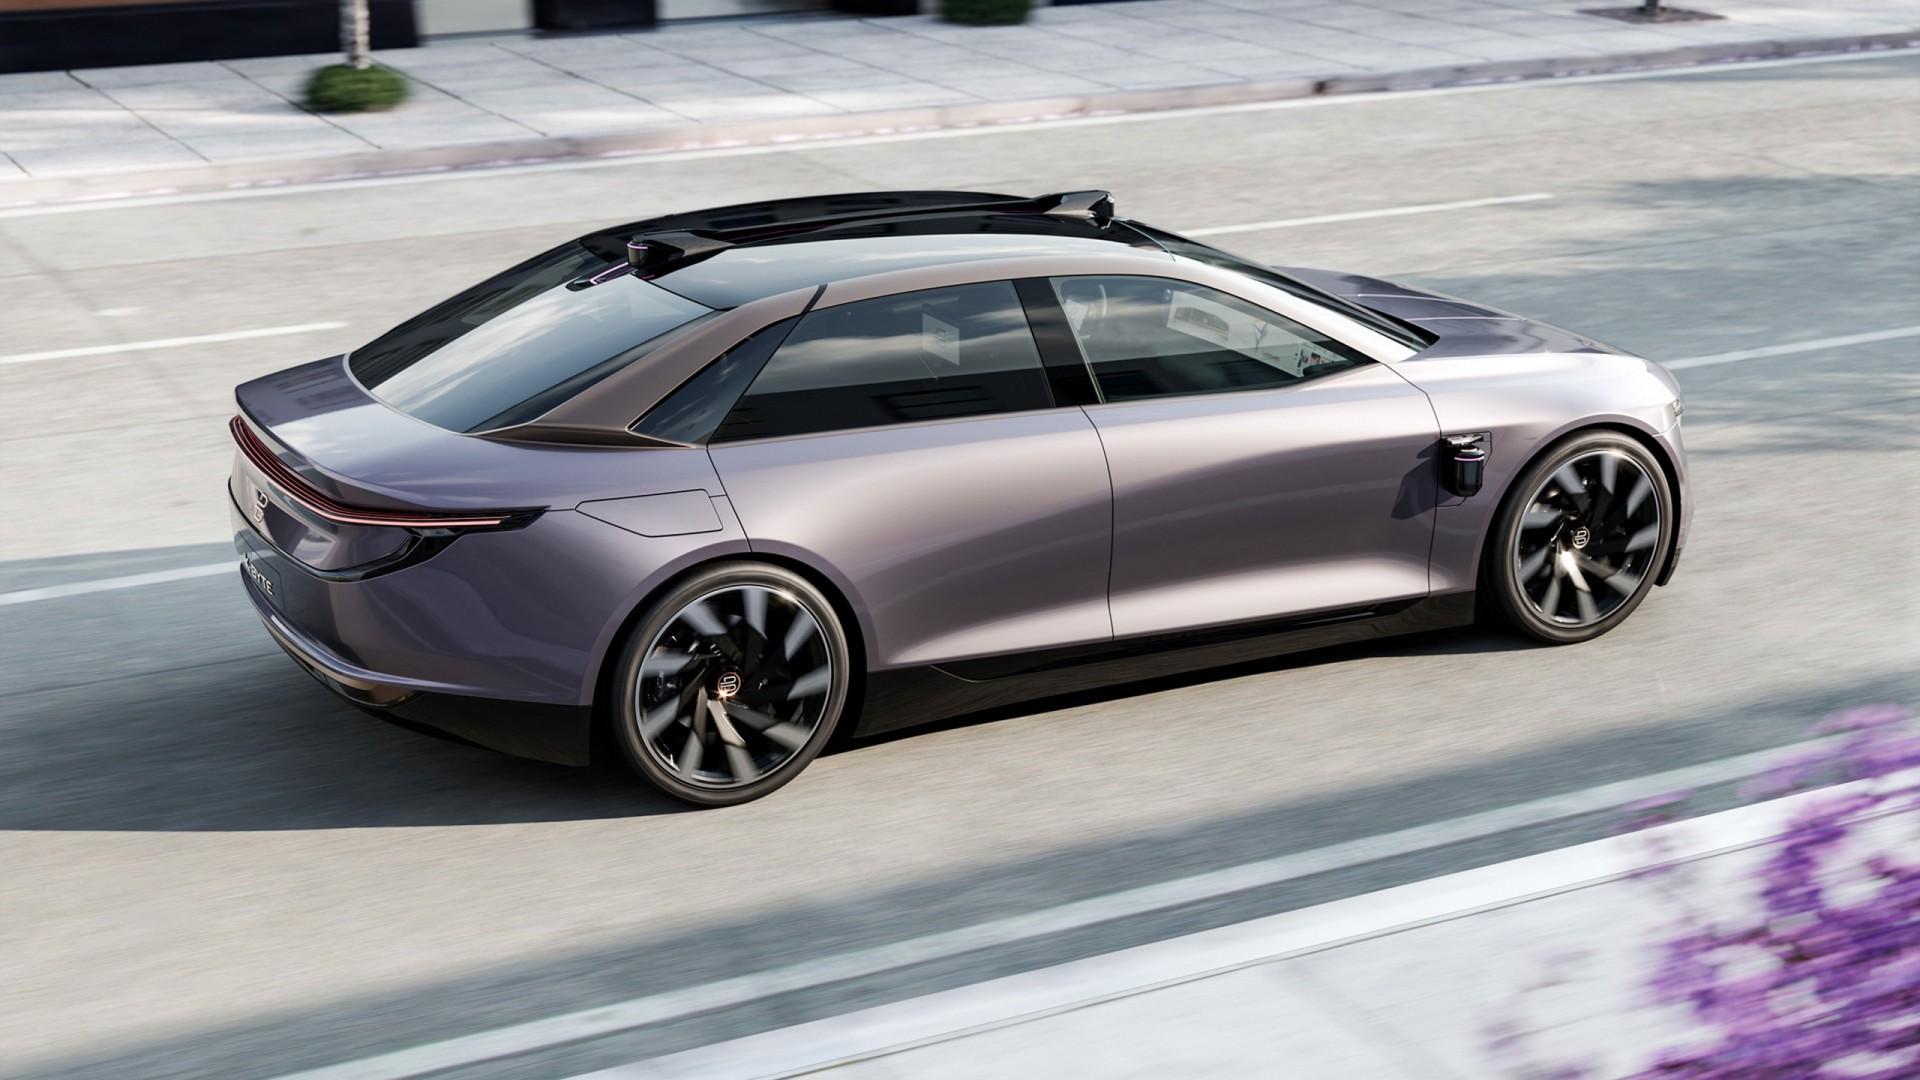 Wallpaper Byton K-Byte Concept, electric car, 2018 Cars ...